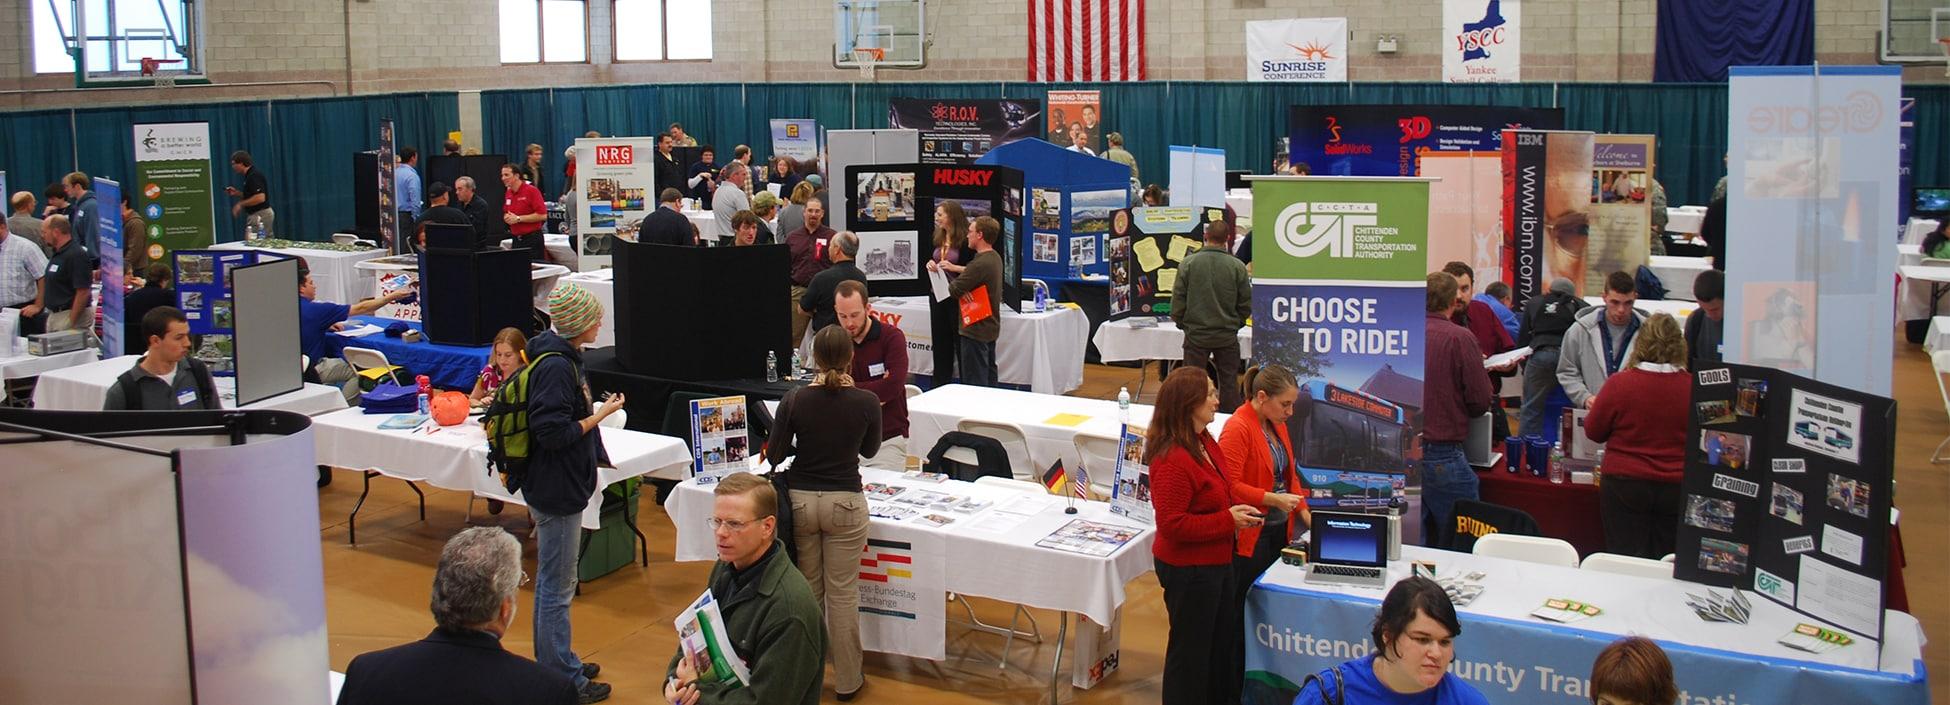 Career Fair, Randolph Center campus